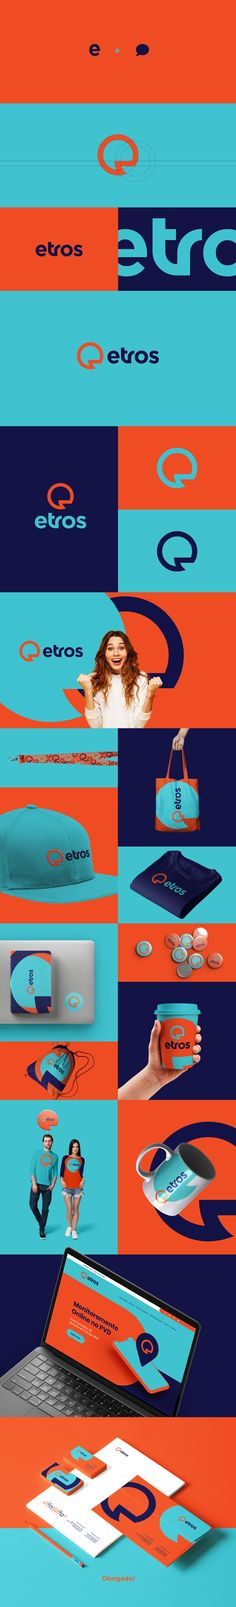 Best Brand Identity Designs Of The Week 12 - Branding design - identity - Graphic Design Inspiration Brand Identity Design, Graphic Design Branding, Graphic Design Posters, Brochure Design, Corporate Branding, Corporate Design, Logo Branding, Logo Inspiration, Design Corporativo